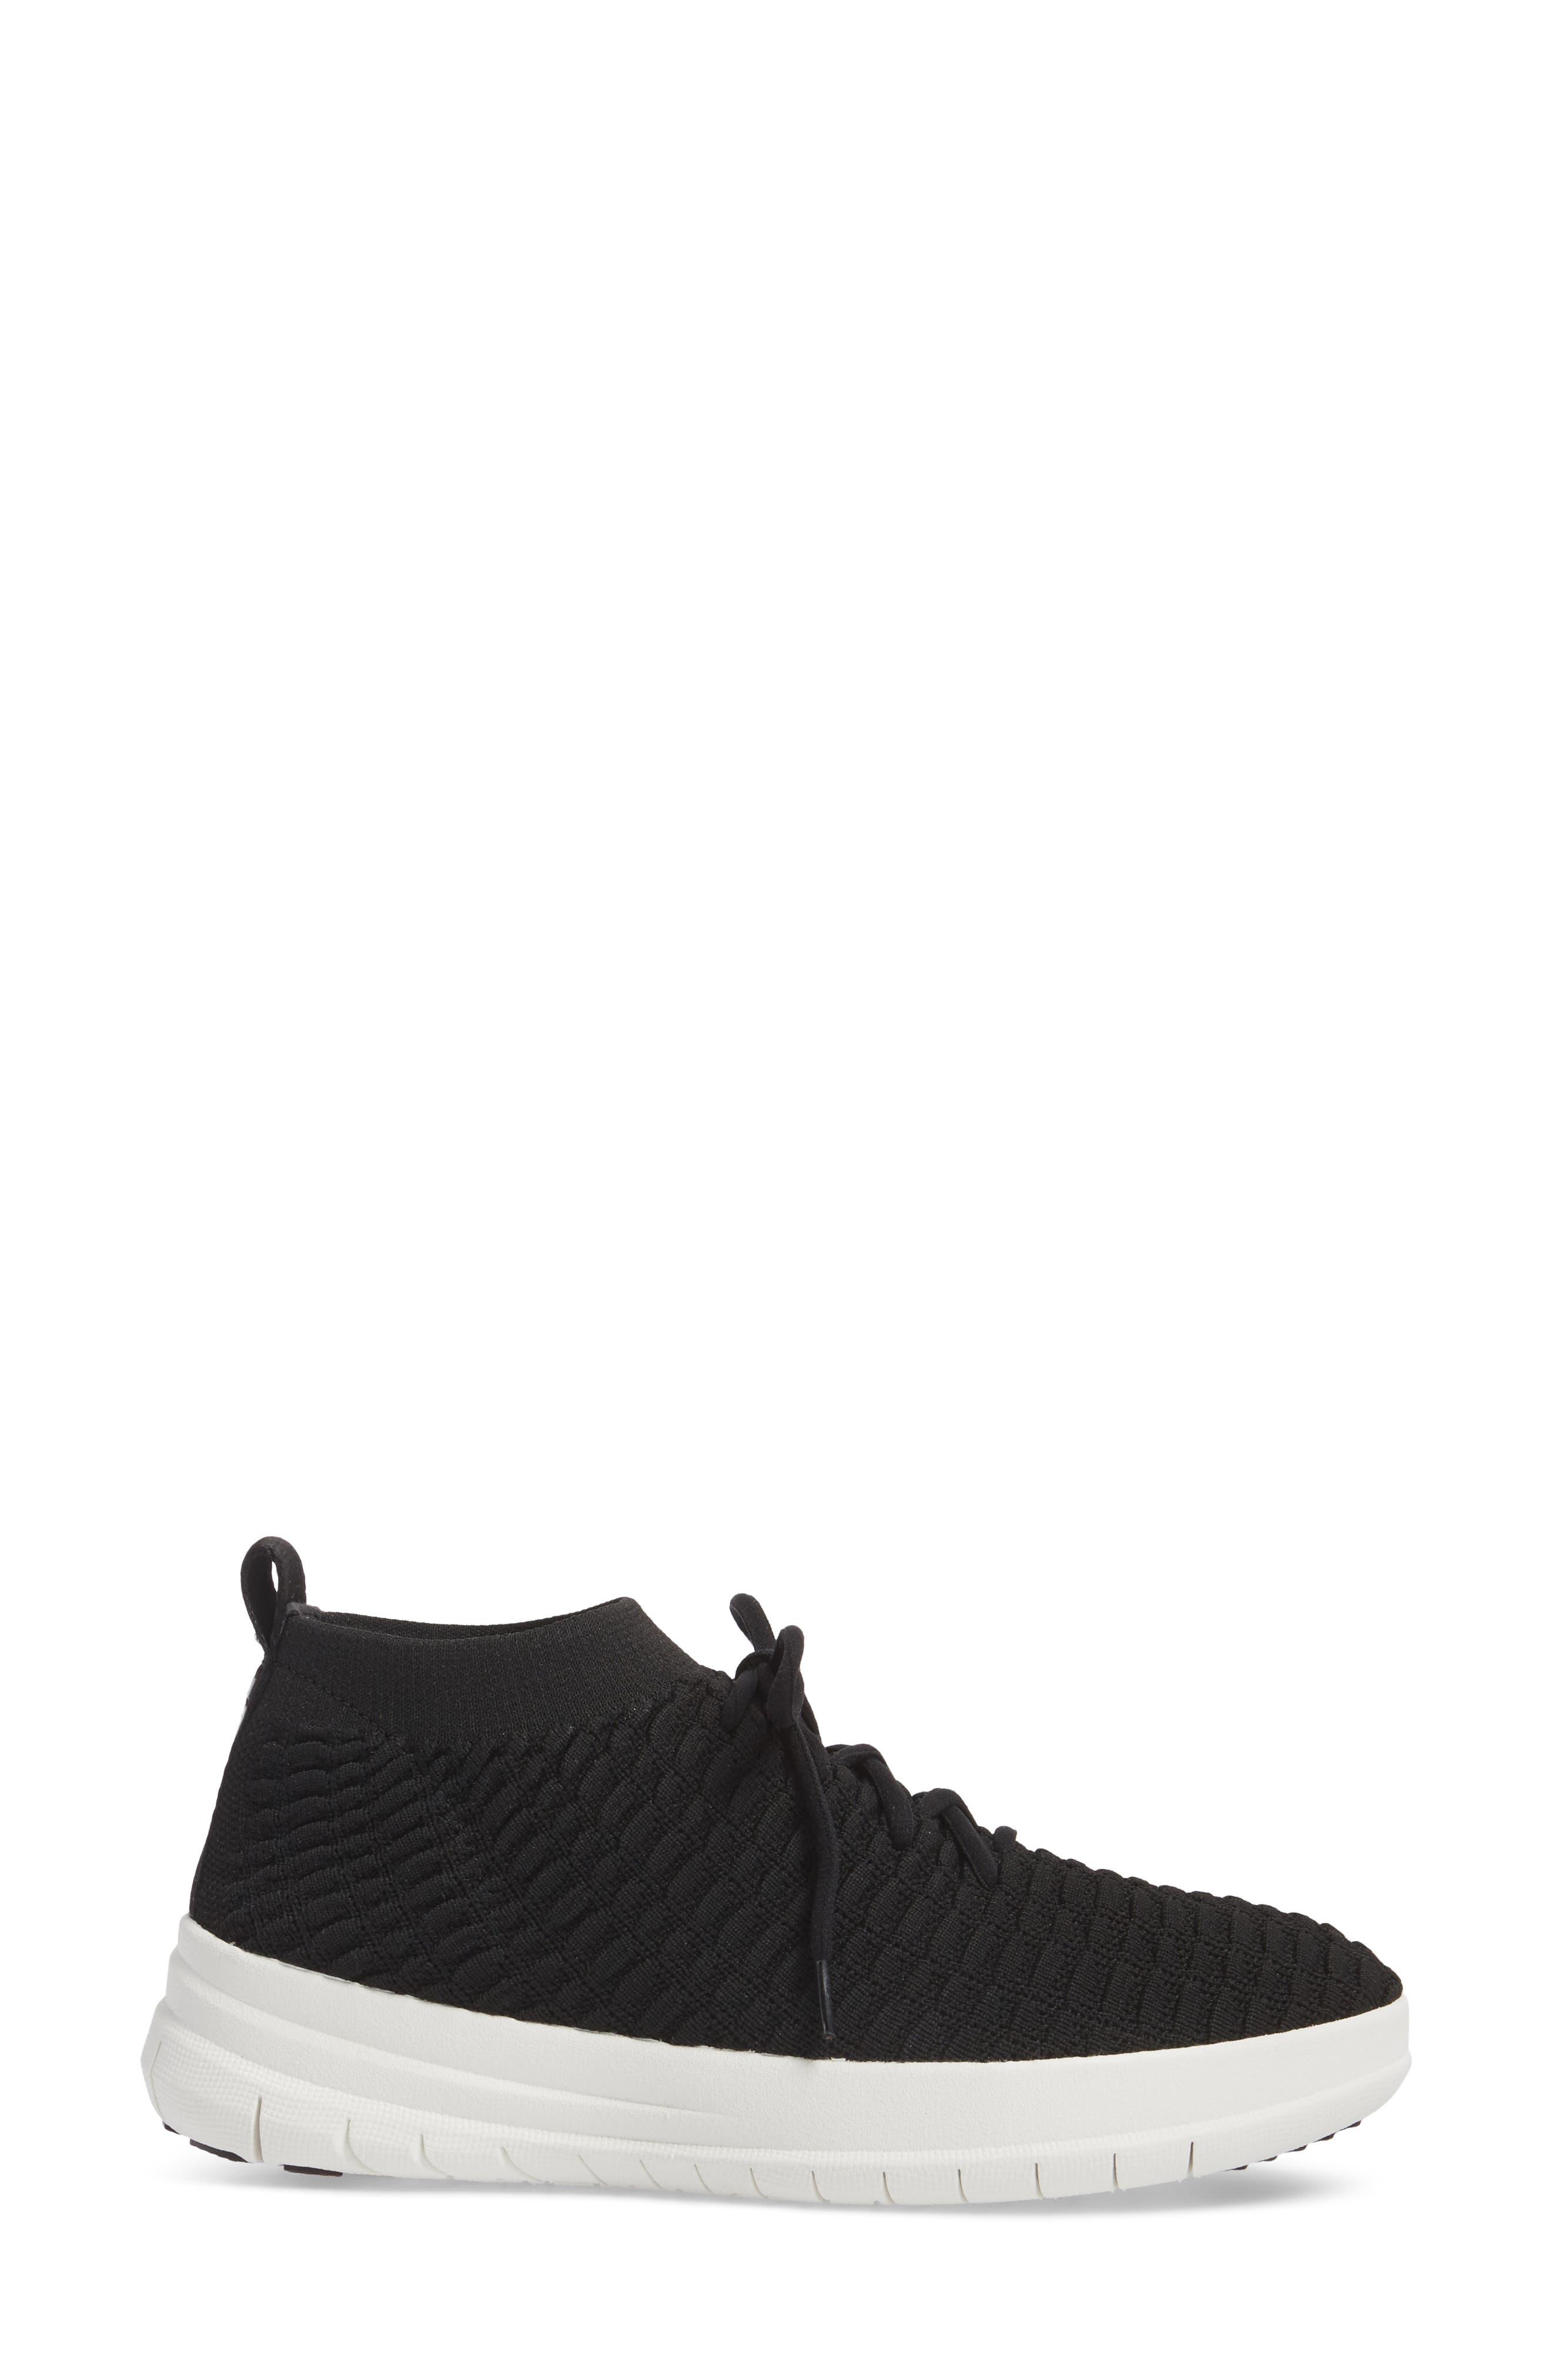 Uberknit<sup>™</sup> Slip-On High Top Sneaker,                             Alternate thumbnail 3, color,                             001